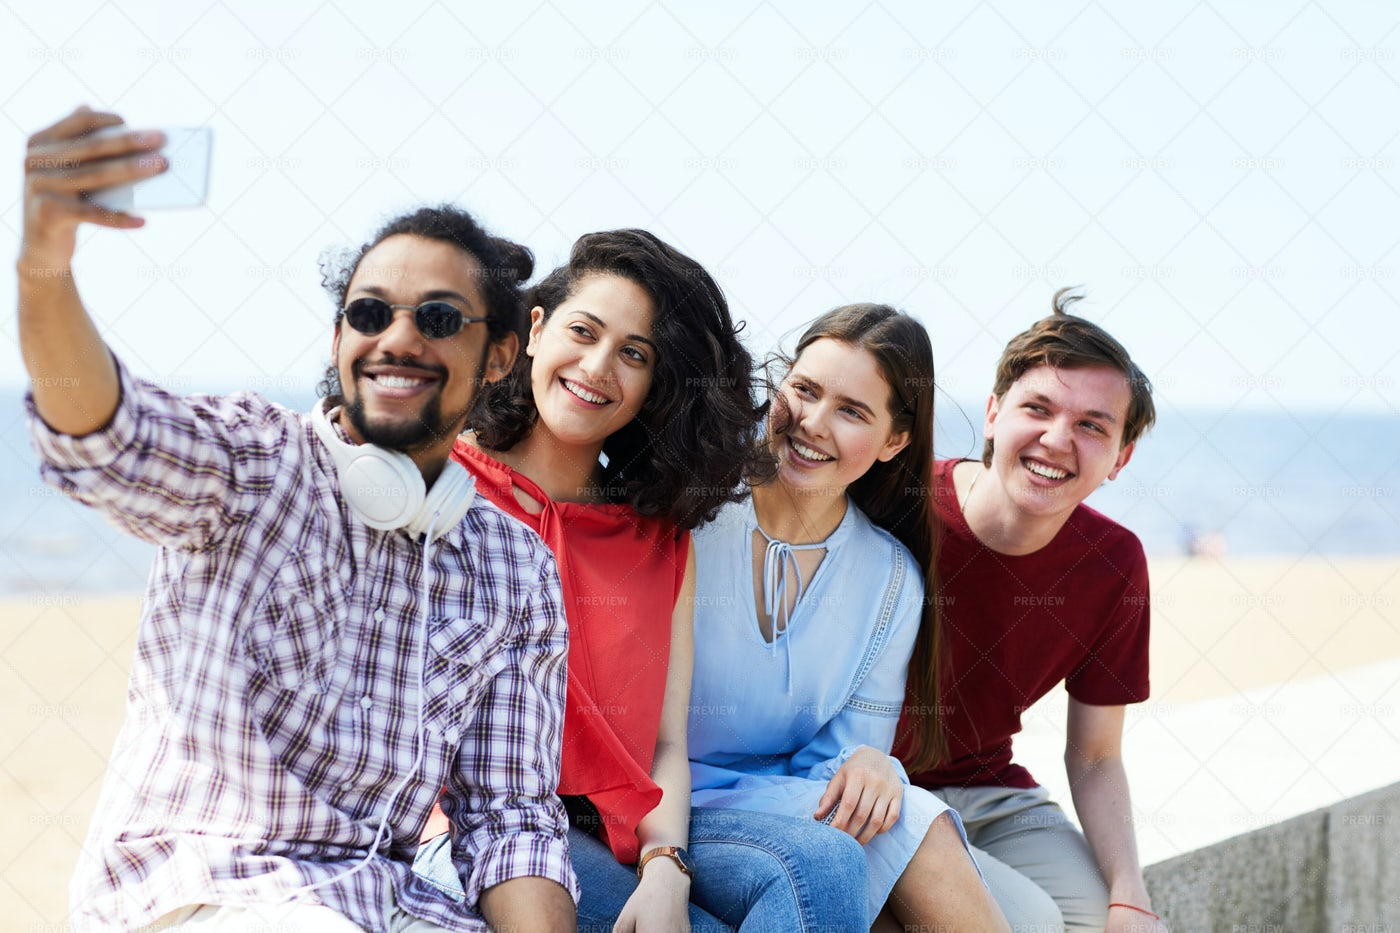 Friends Taking Selfie At Beach: Stock Photos